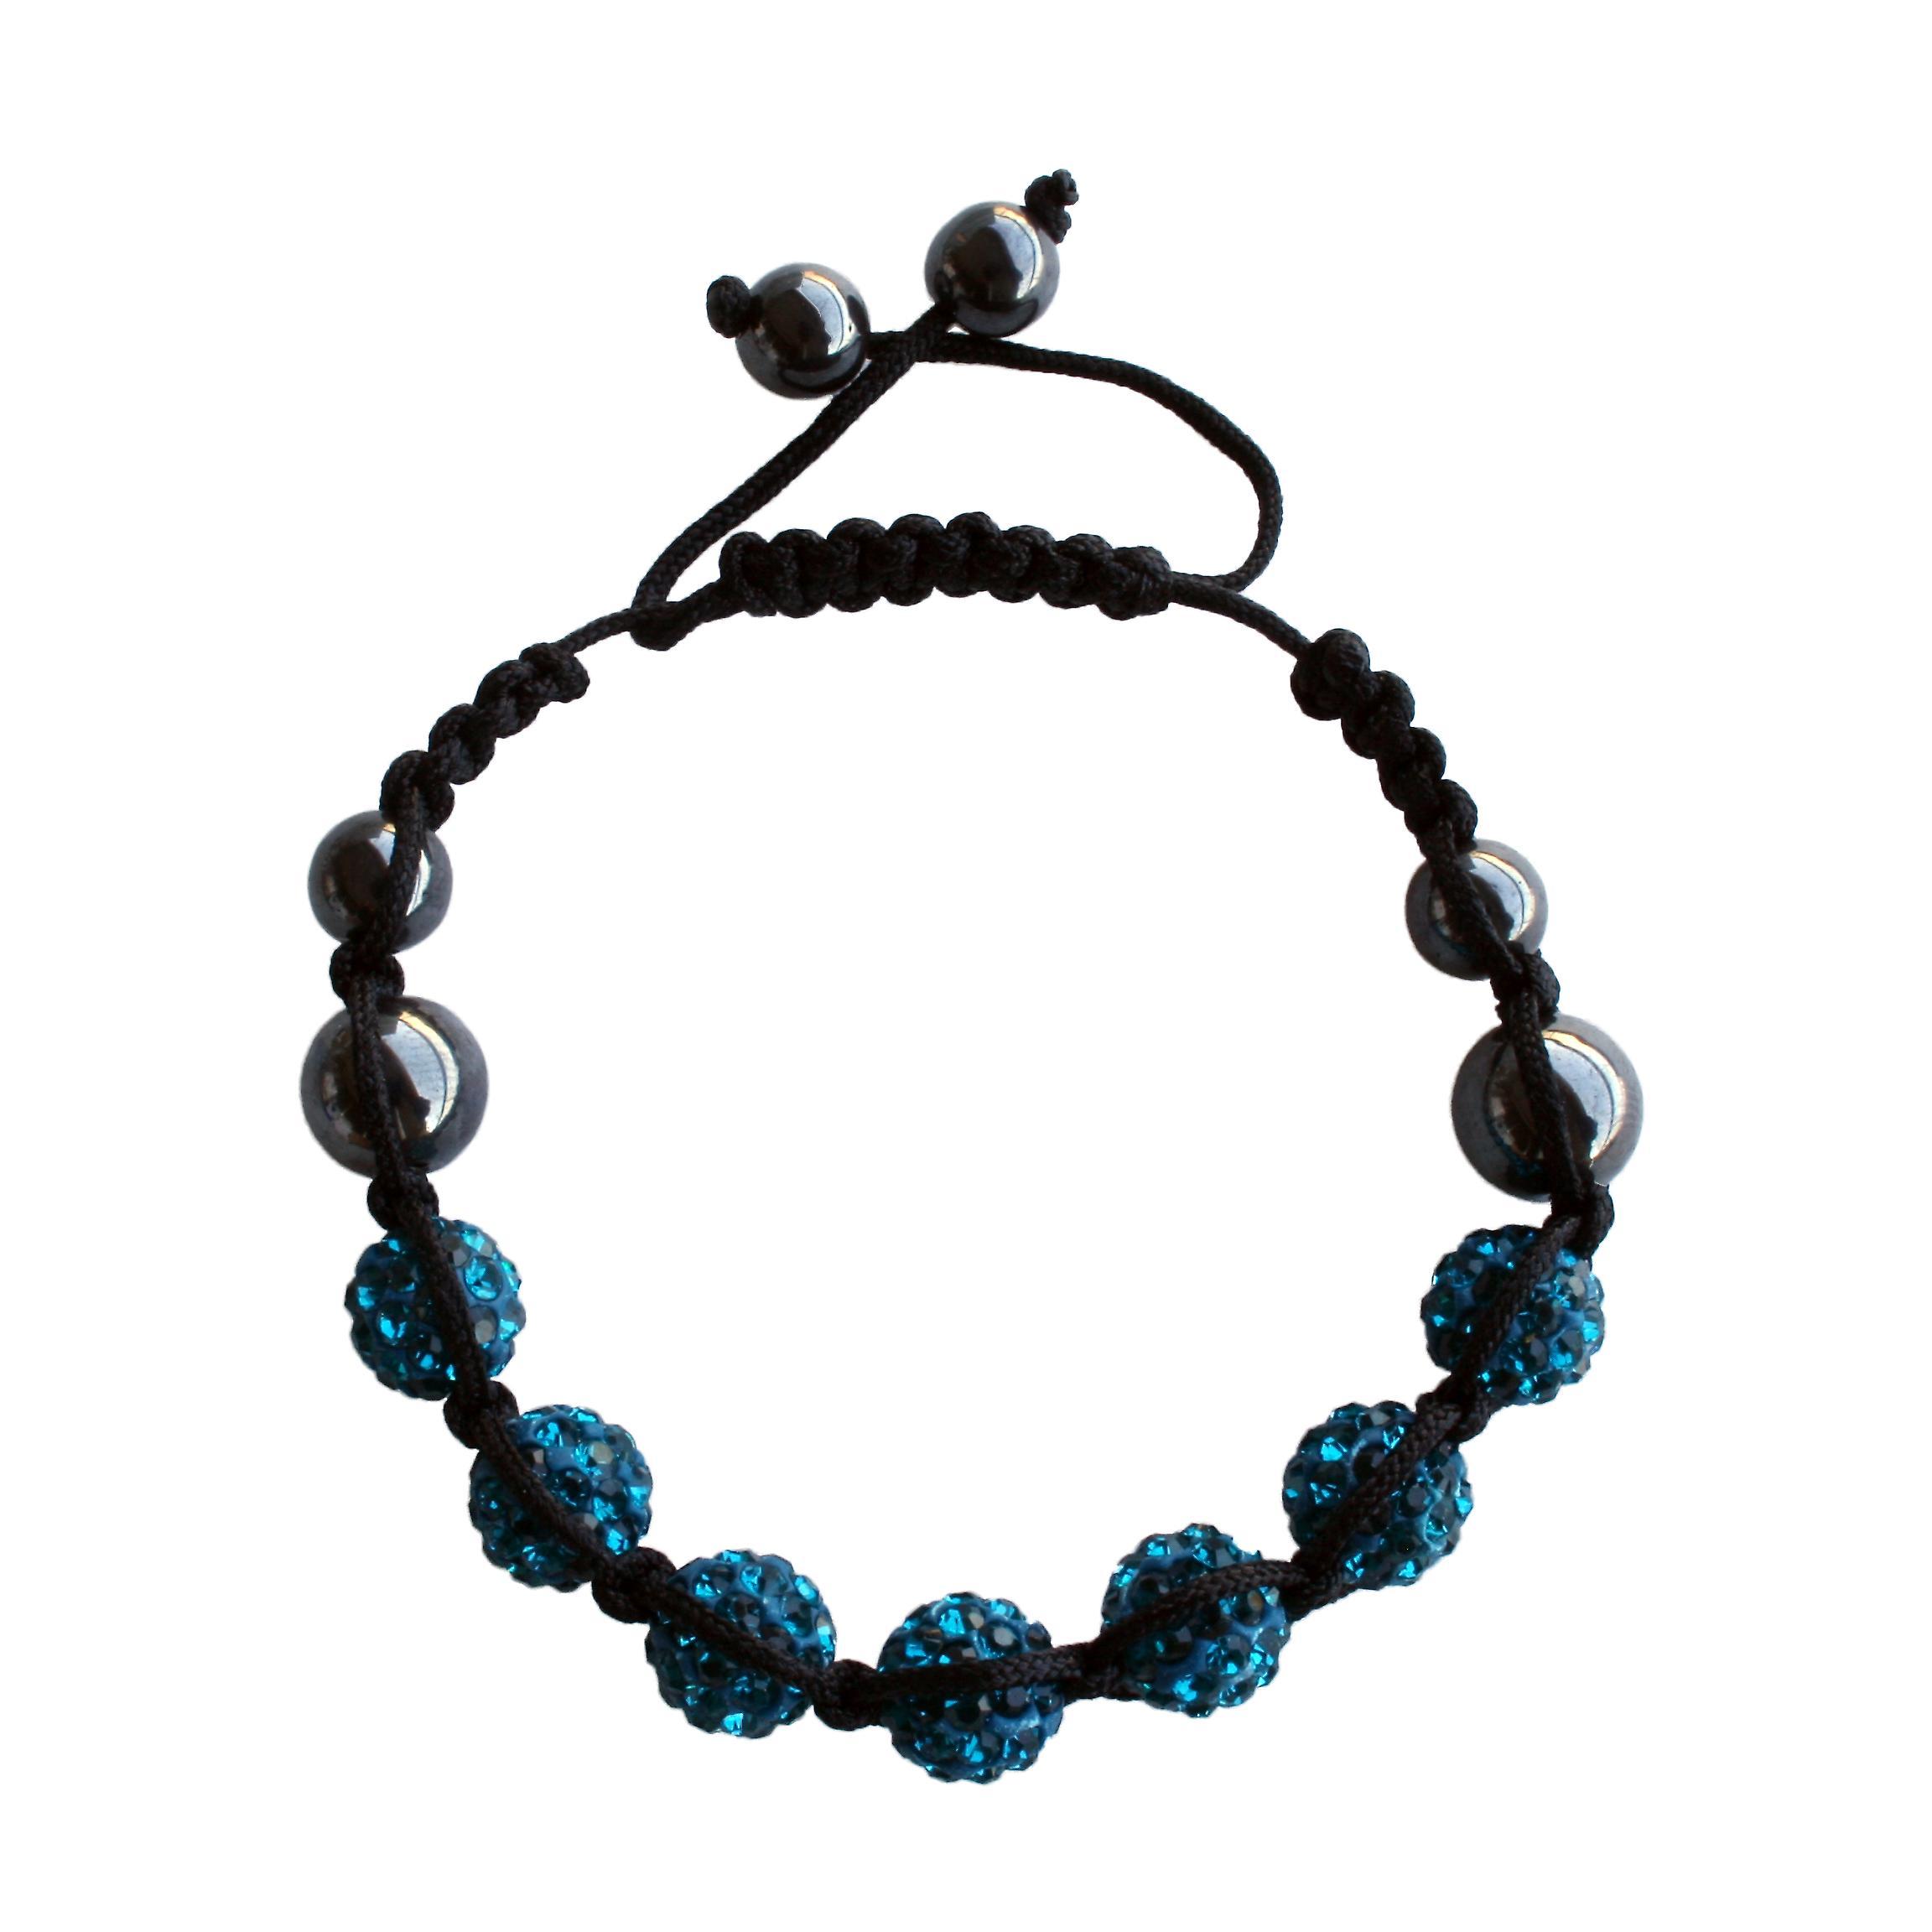 Waooh - Jewelry - Bracelet